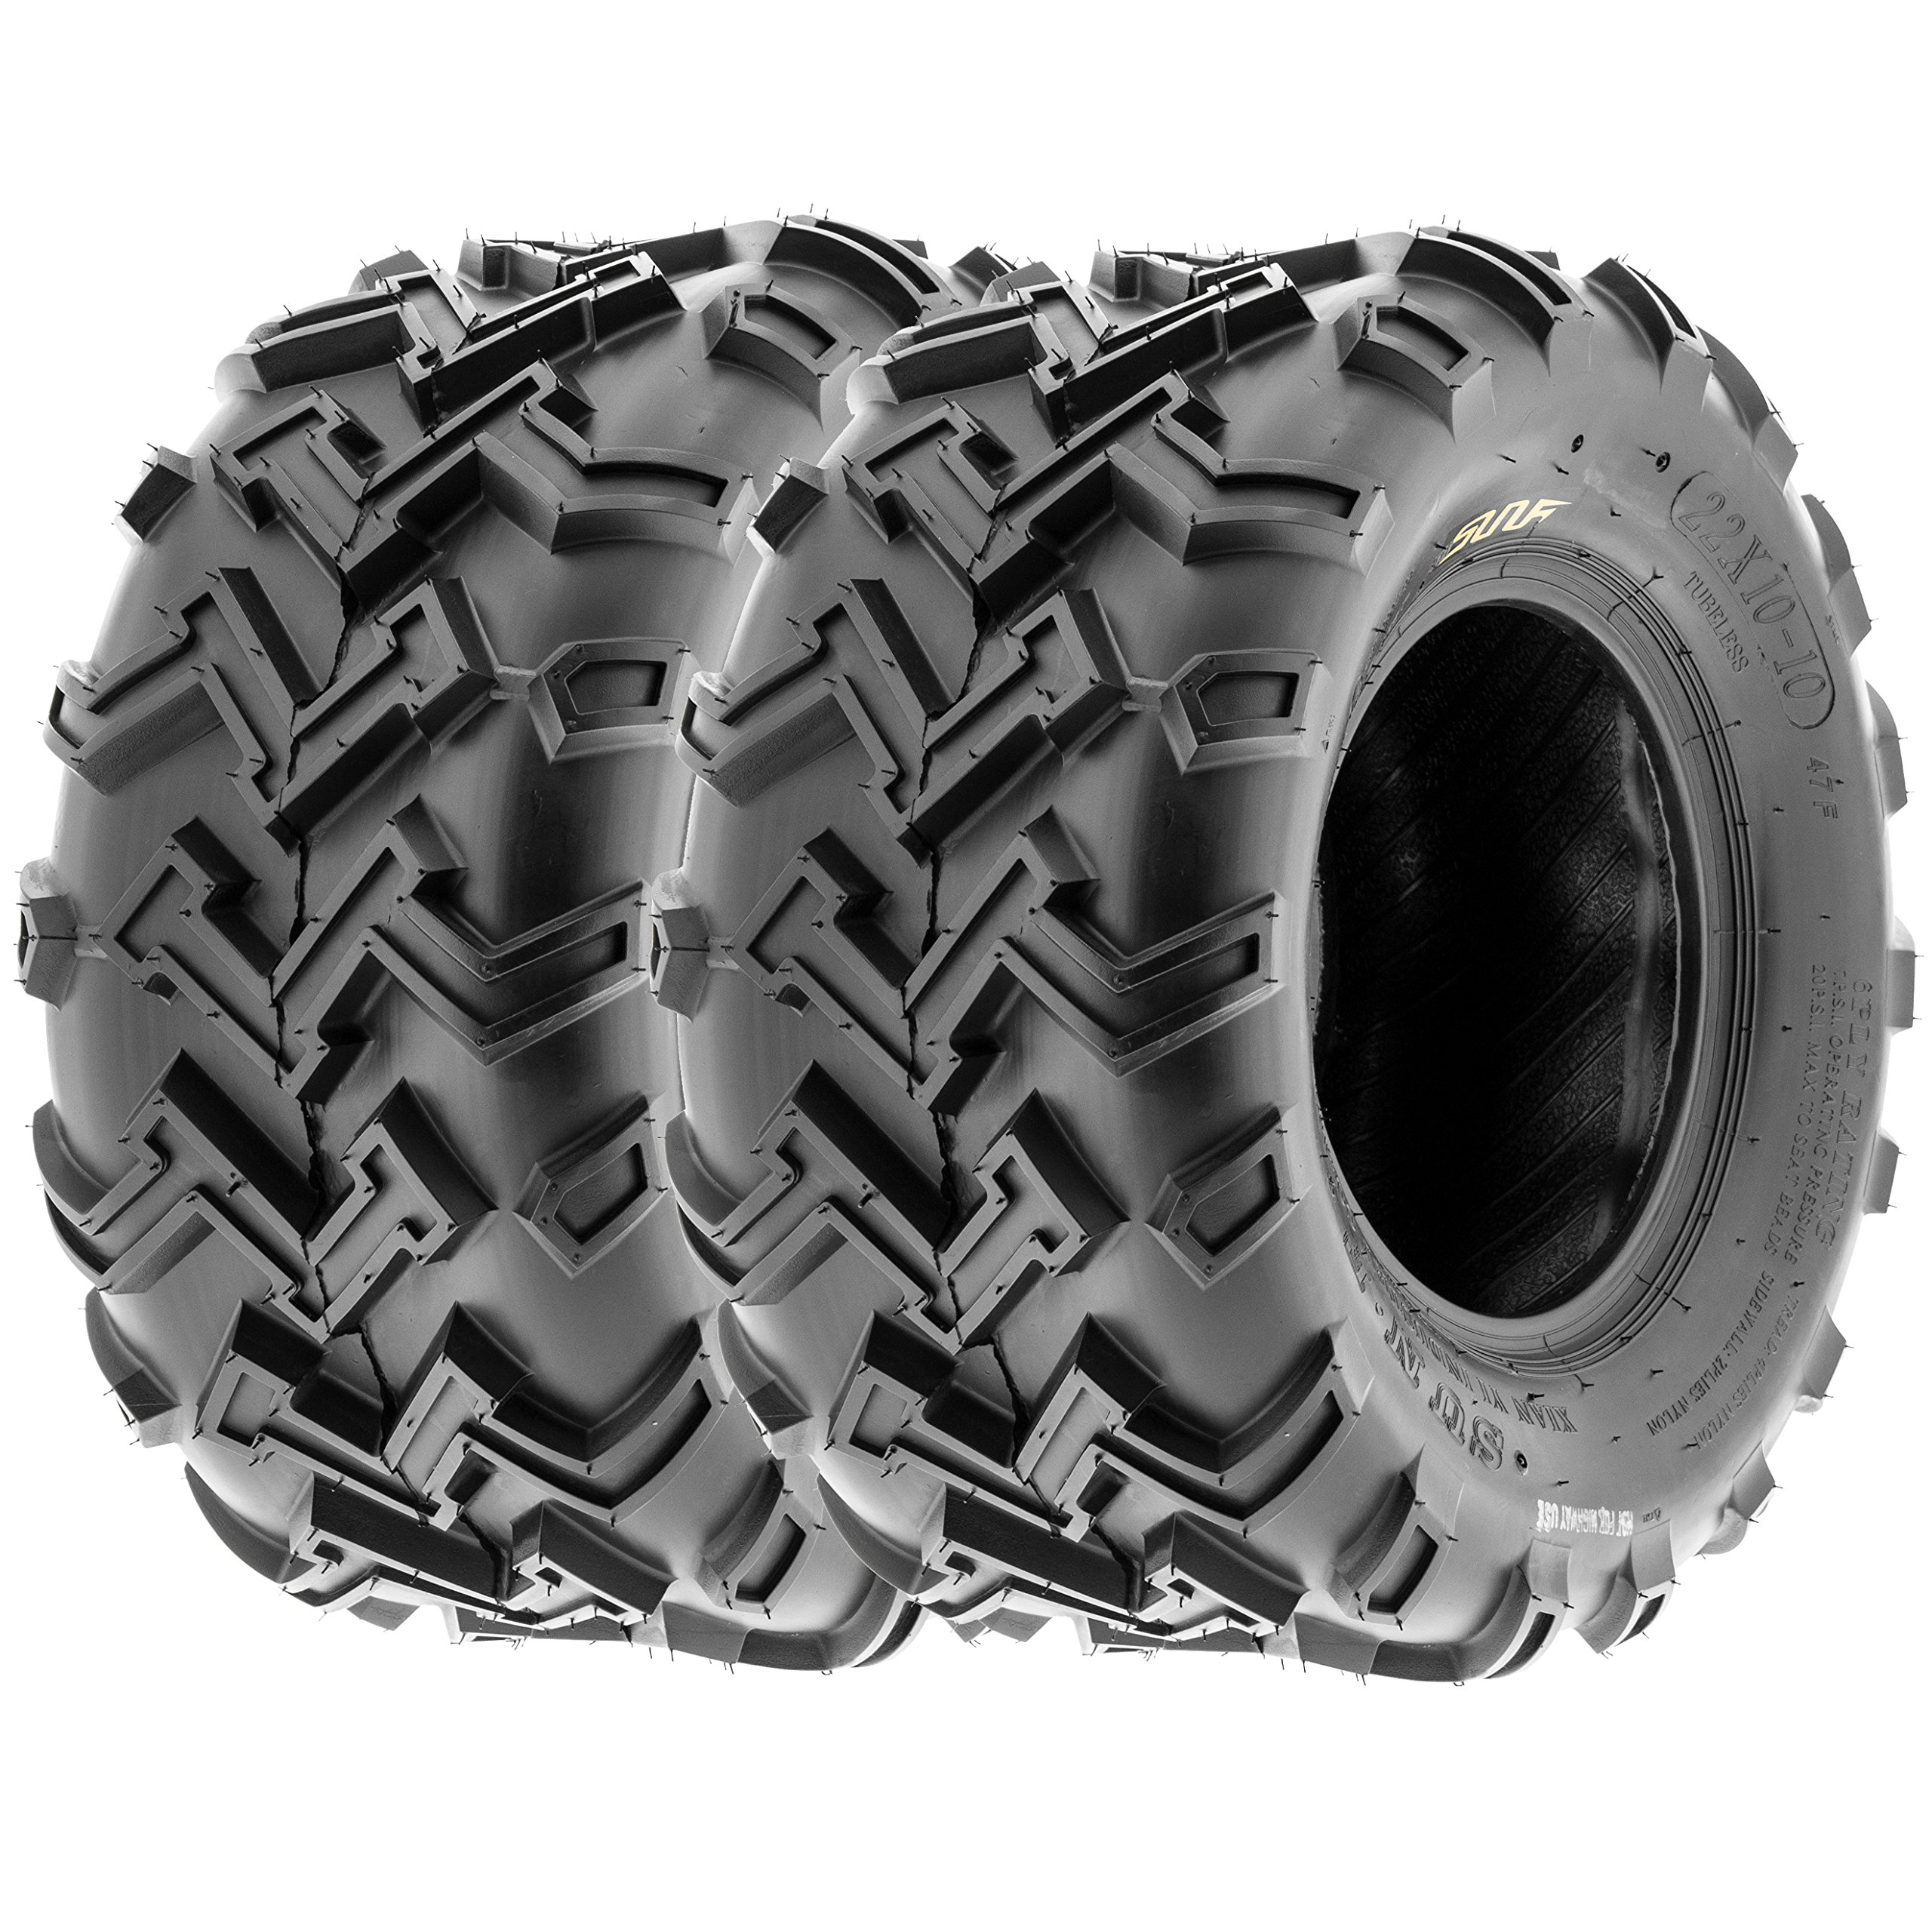 SunF ATV UTV Rear Tires 22x10-10 22x10x10 4 PLY A001 (Set Pair of 2)